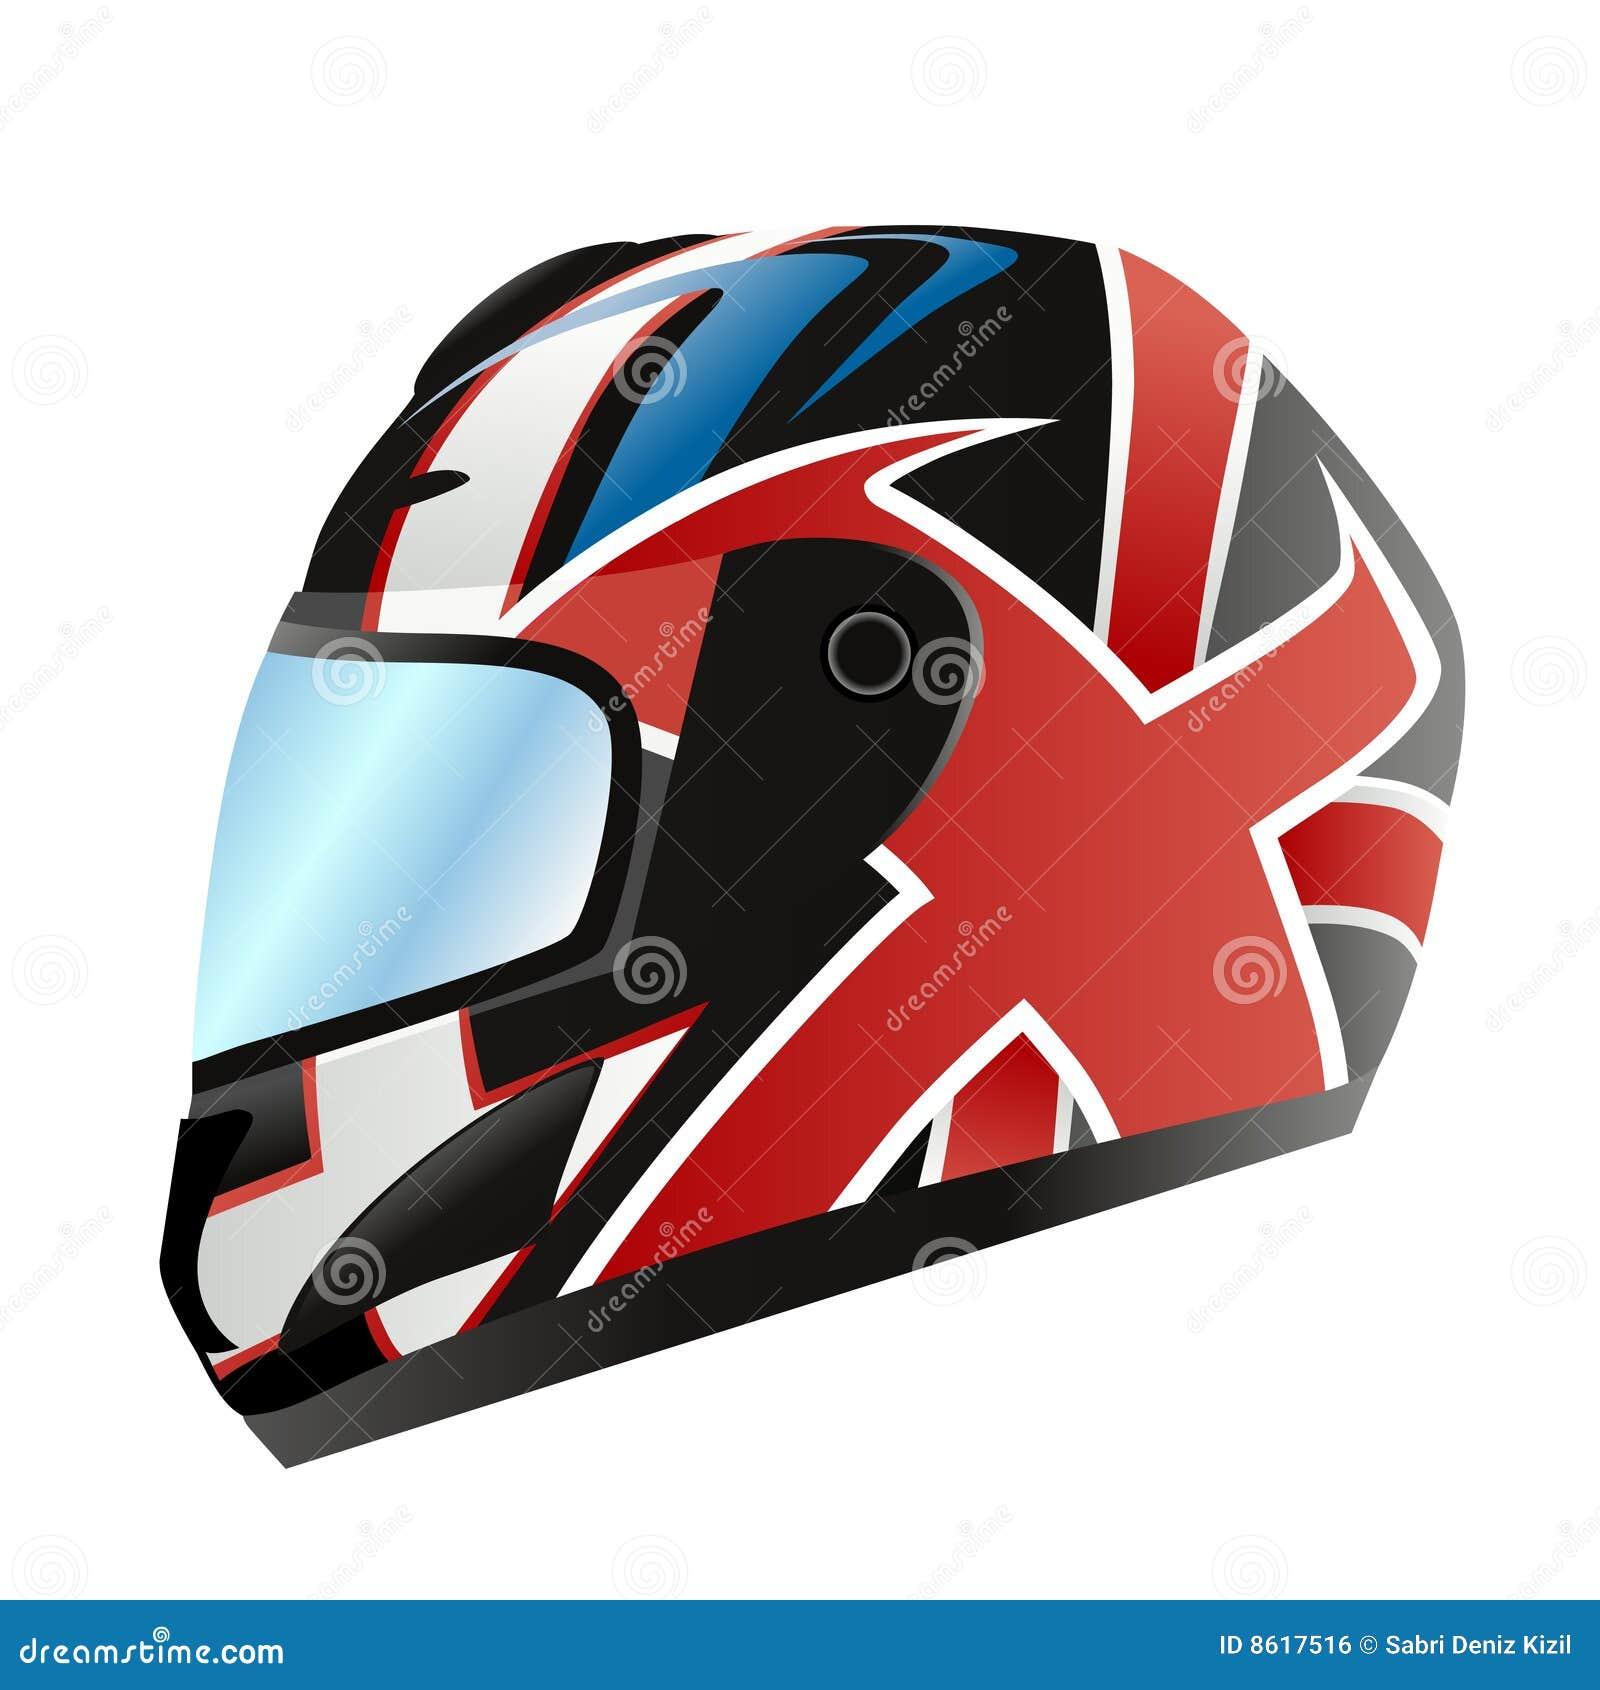 Motorcycle Helmet Vector Royalty Free Stock Image Image